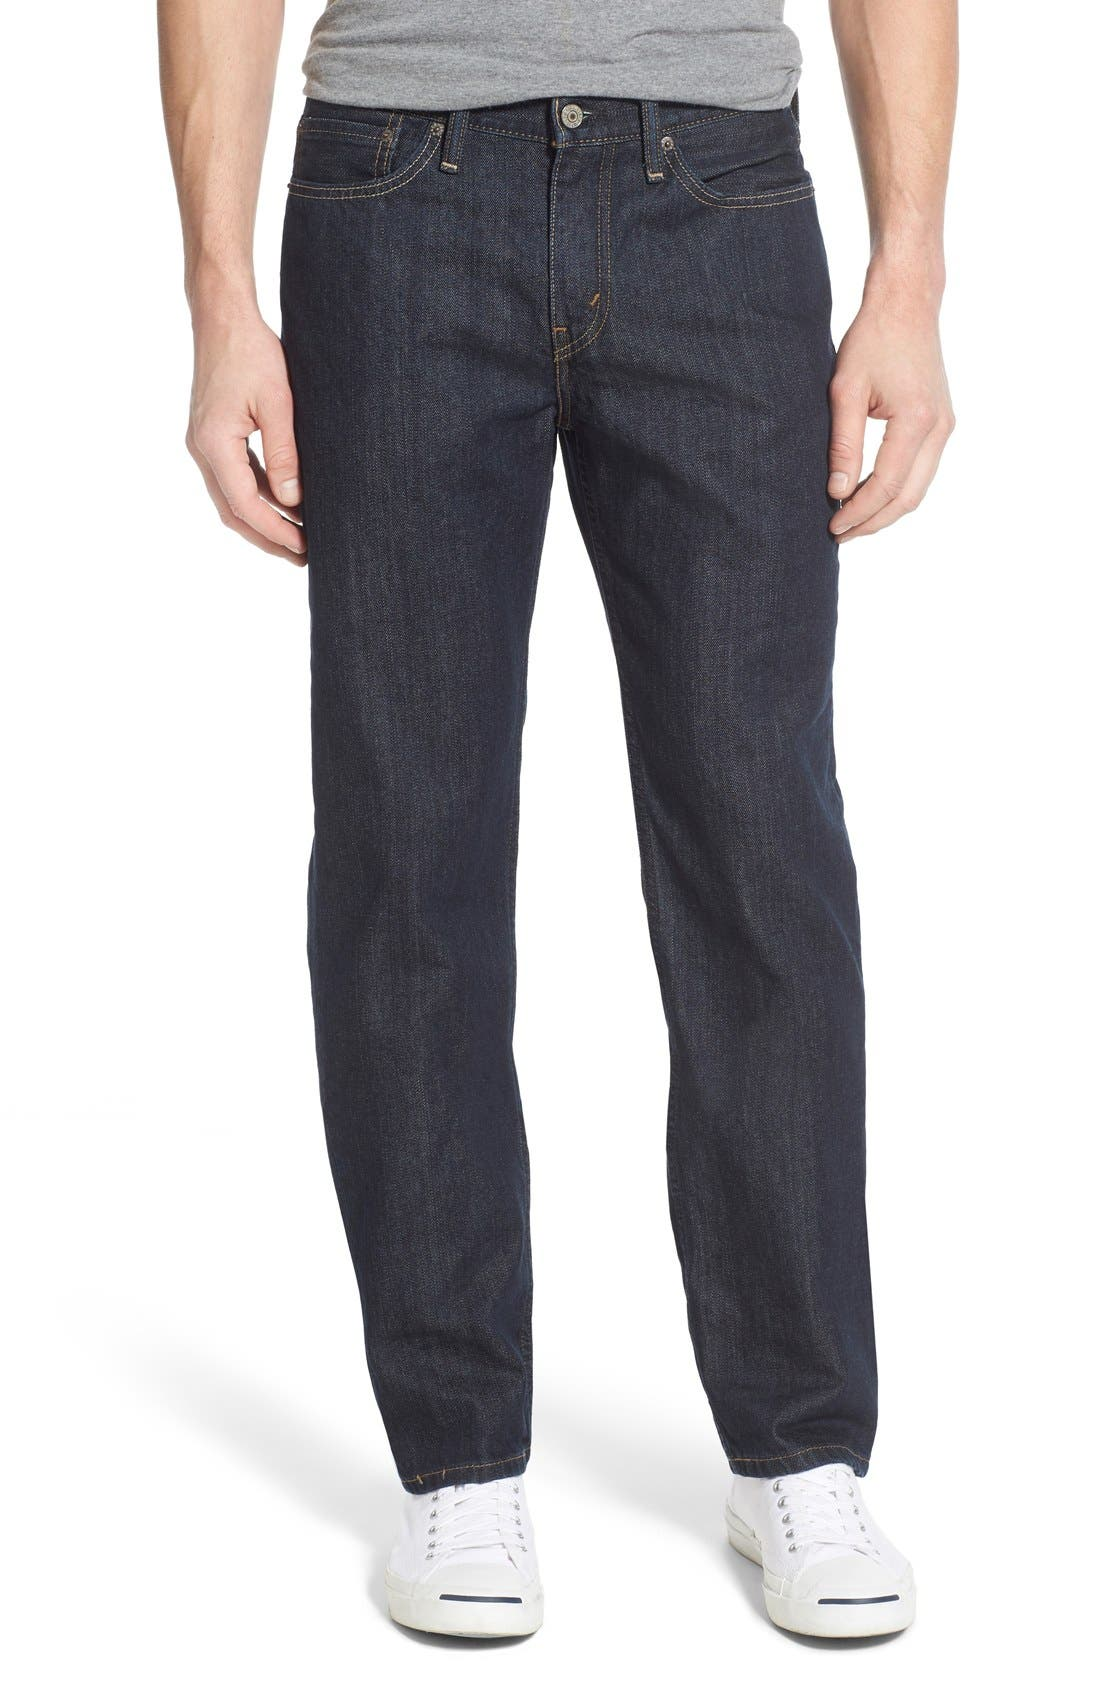 Mens Jeans 29 X 34